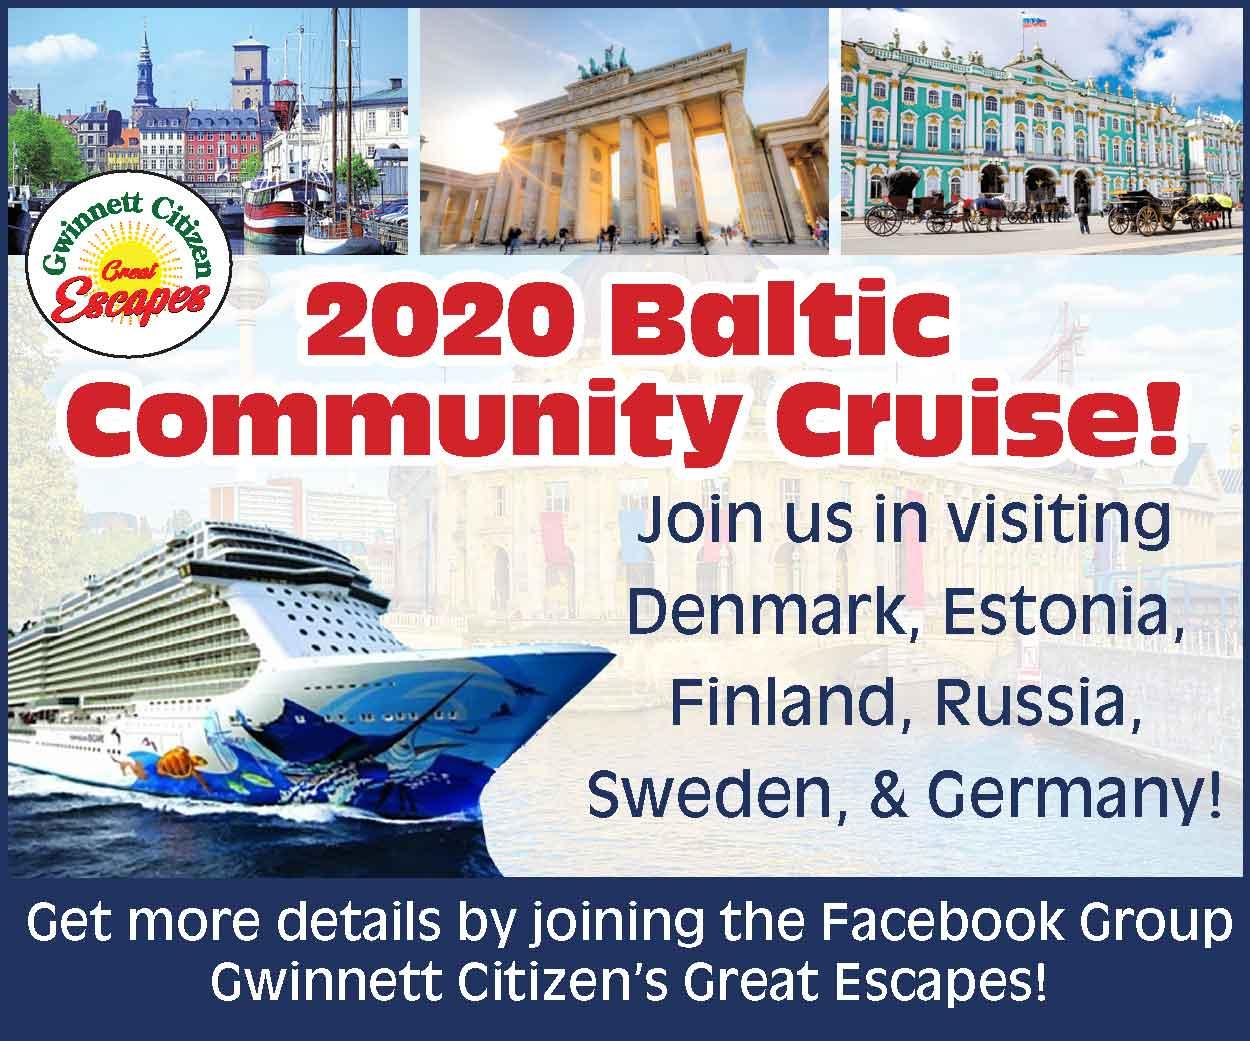 2020 Baltic Community Cruise 300x250